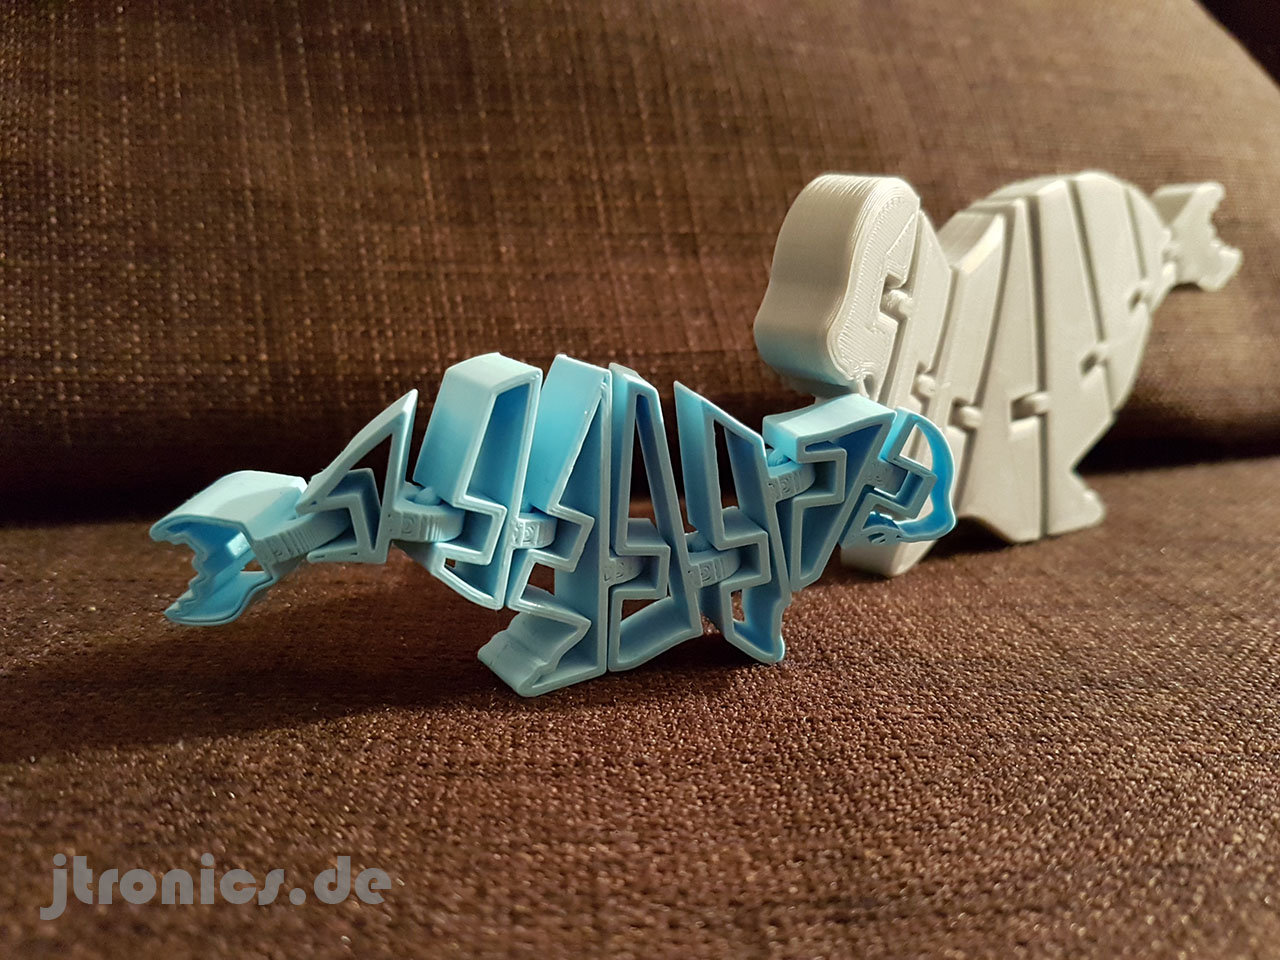 20190508_211759.jpg Download free STL file Flexi Articulated Mini Seadog Seal • 3D printer template, jtronics